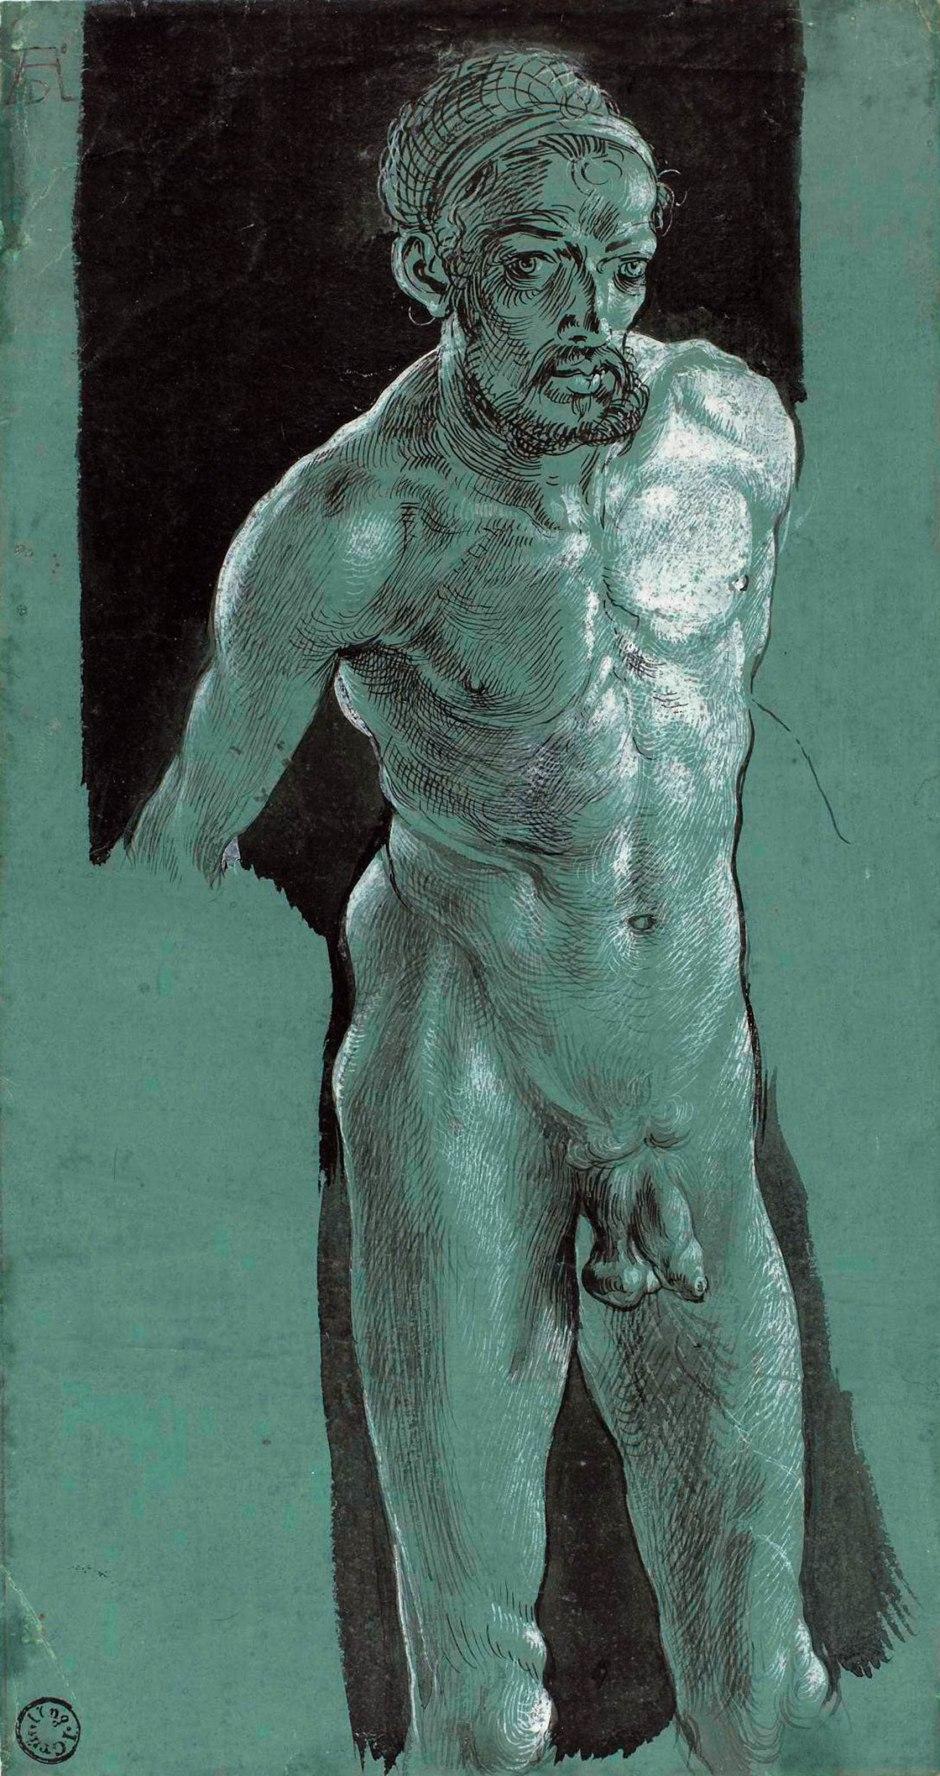 Albrecht Dürer, Autoritratto da nudo, 1509